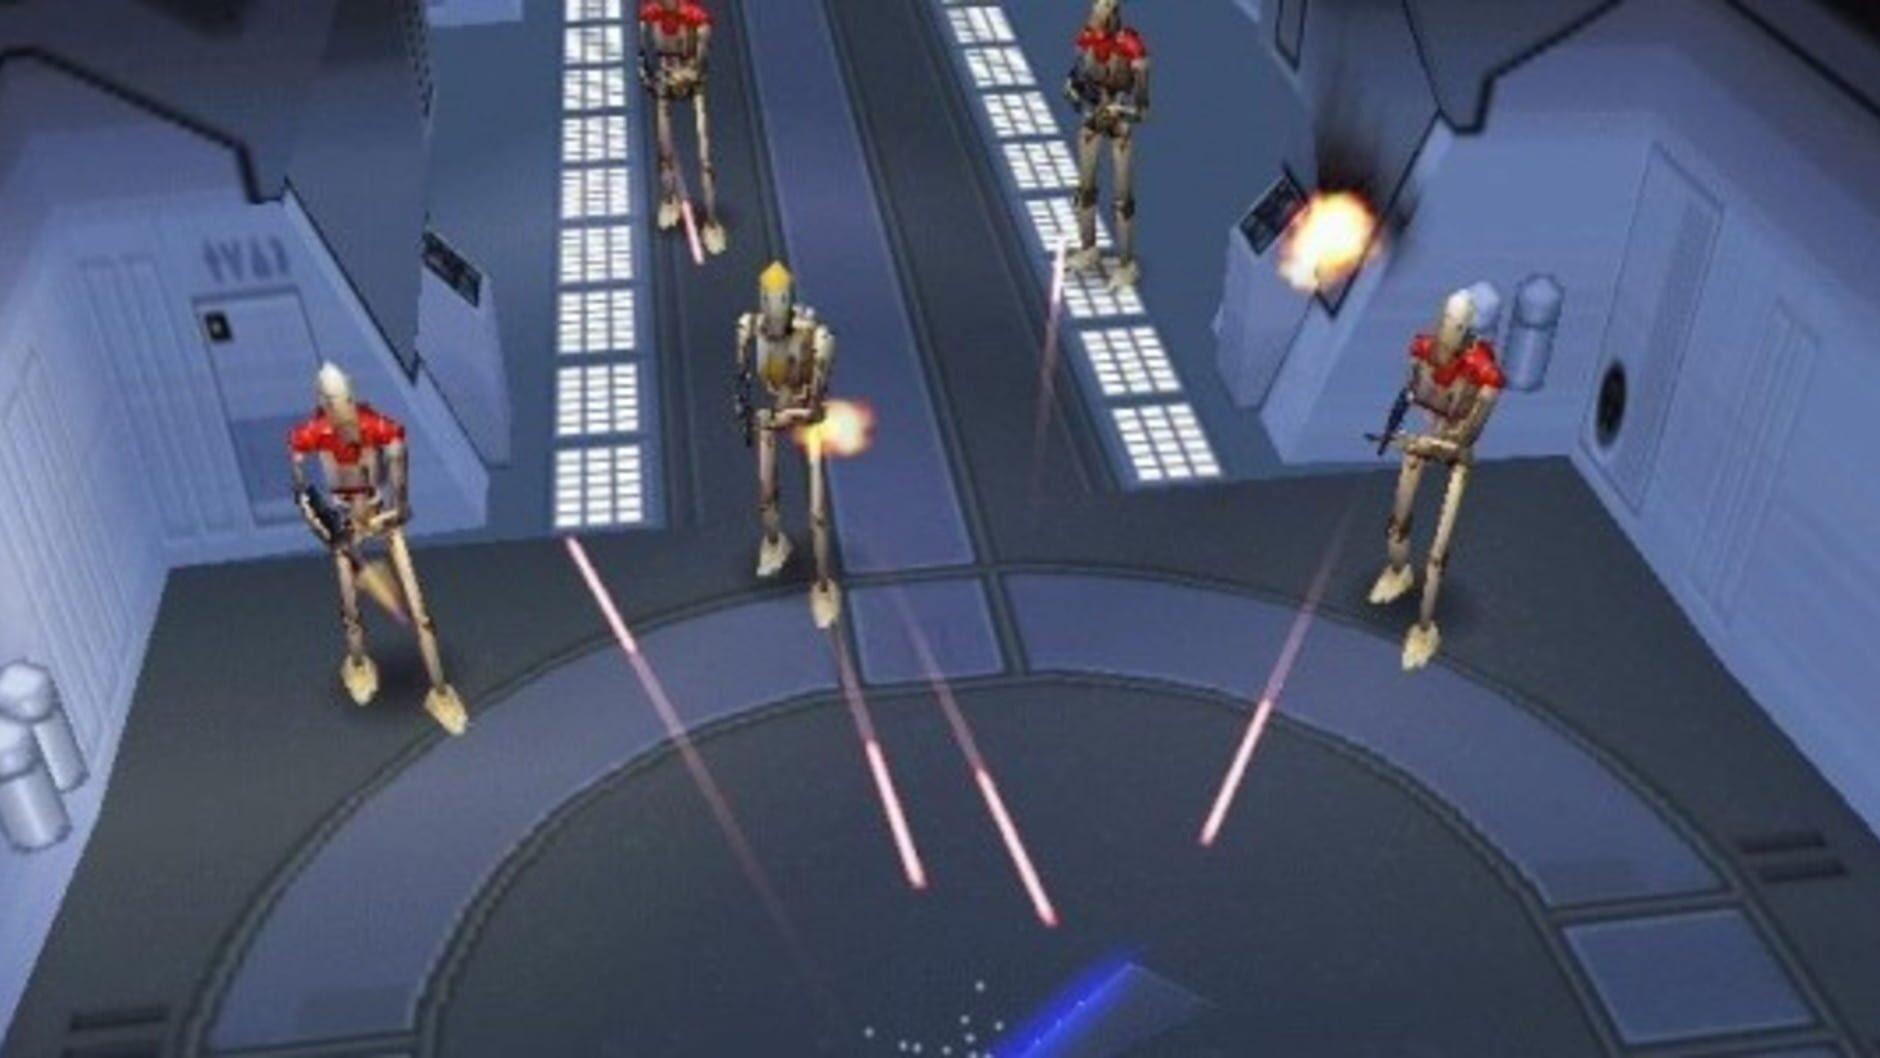 Star Wars Episode I: The Phantom Menace - 1